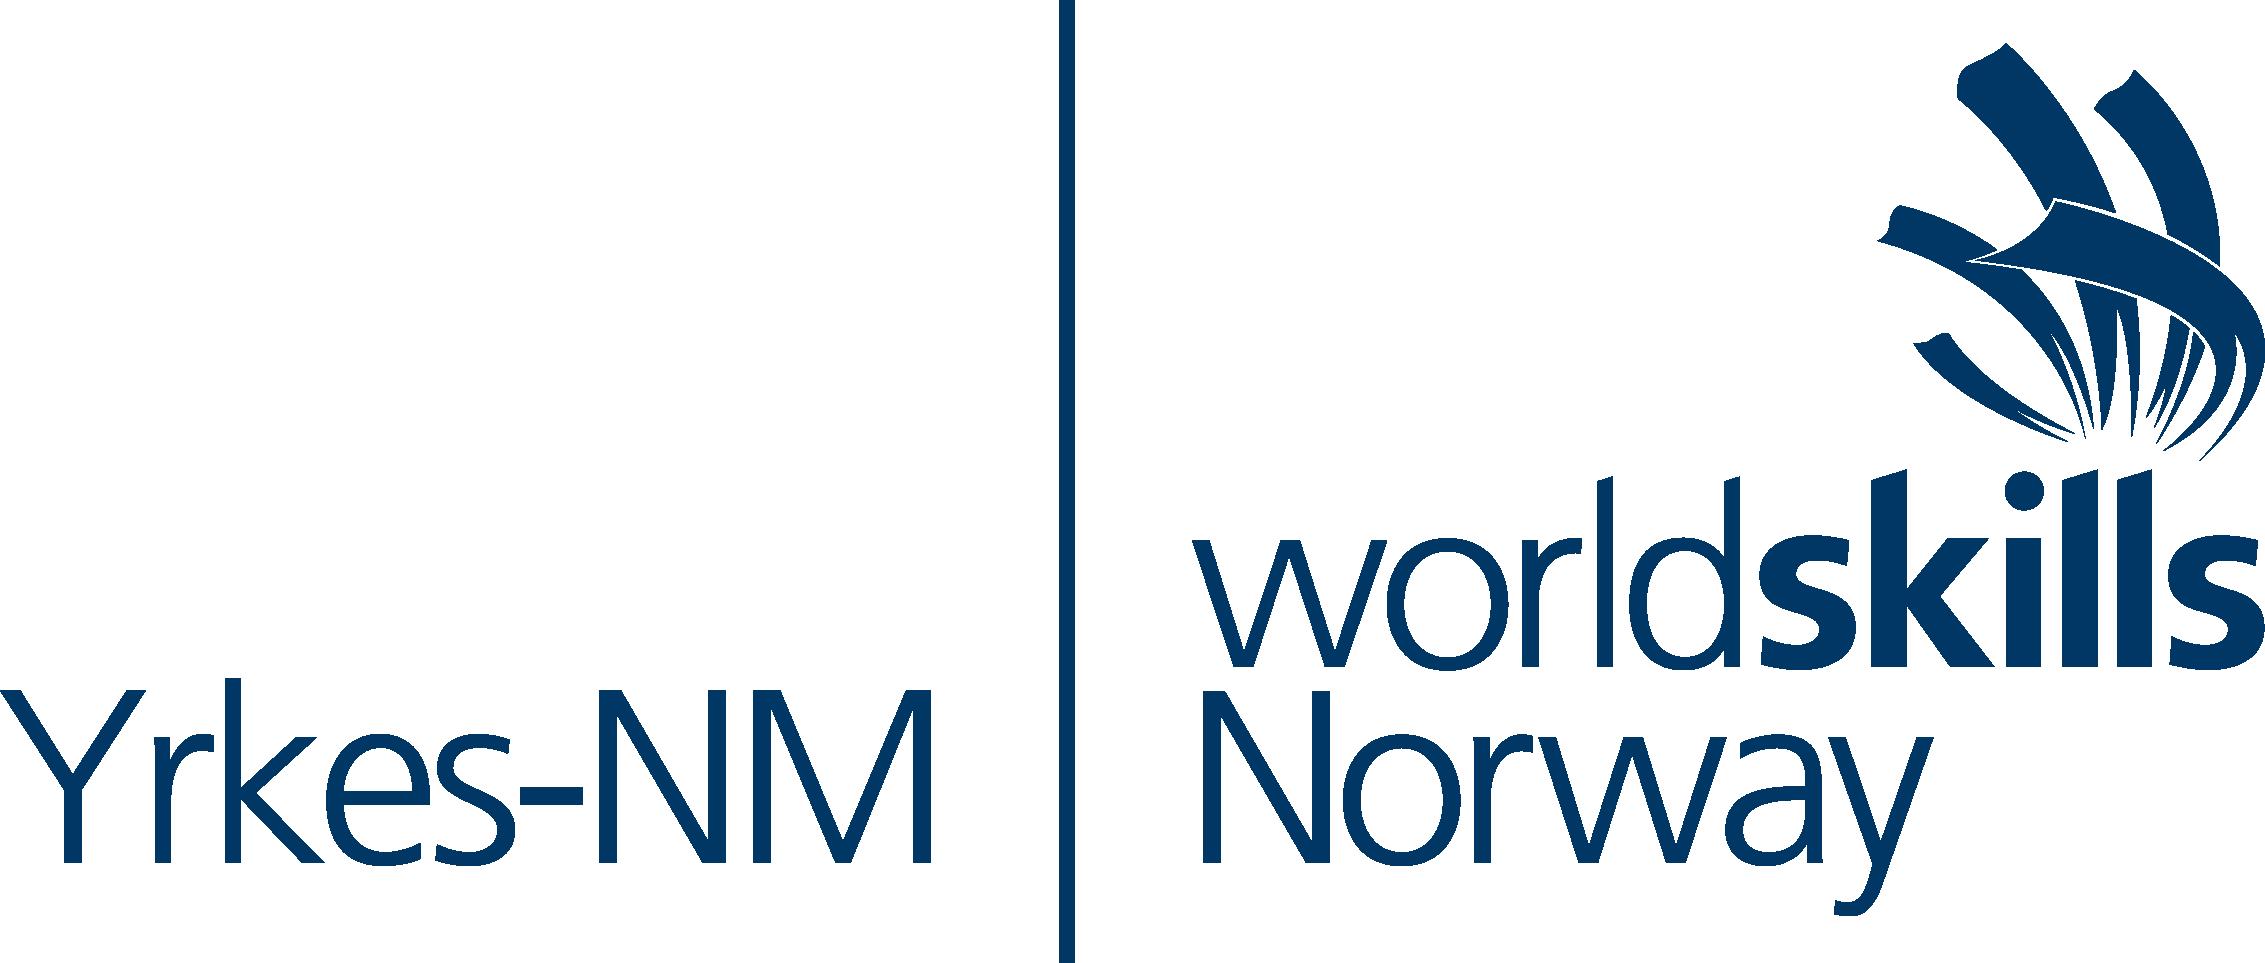 yrkes-nm_logo_horisontal_darkblue_rgb